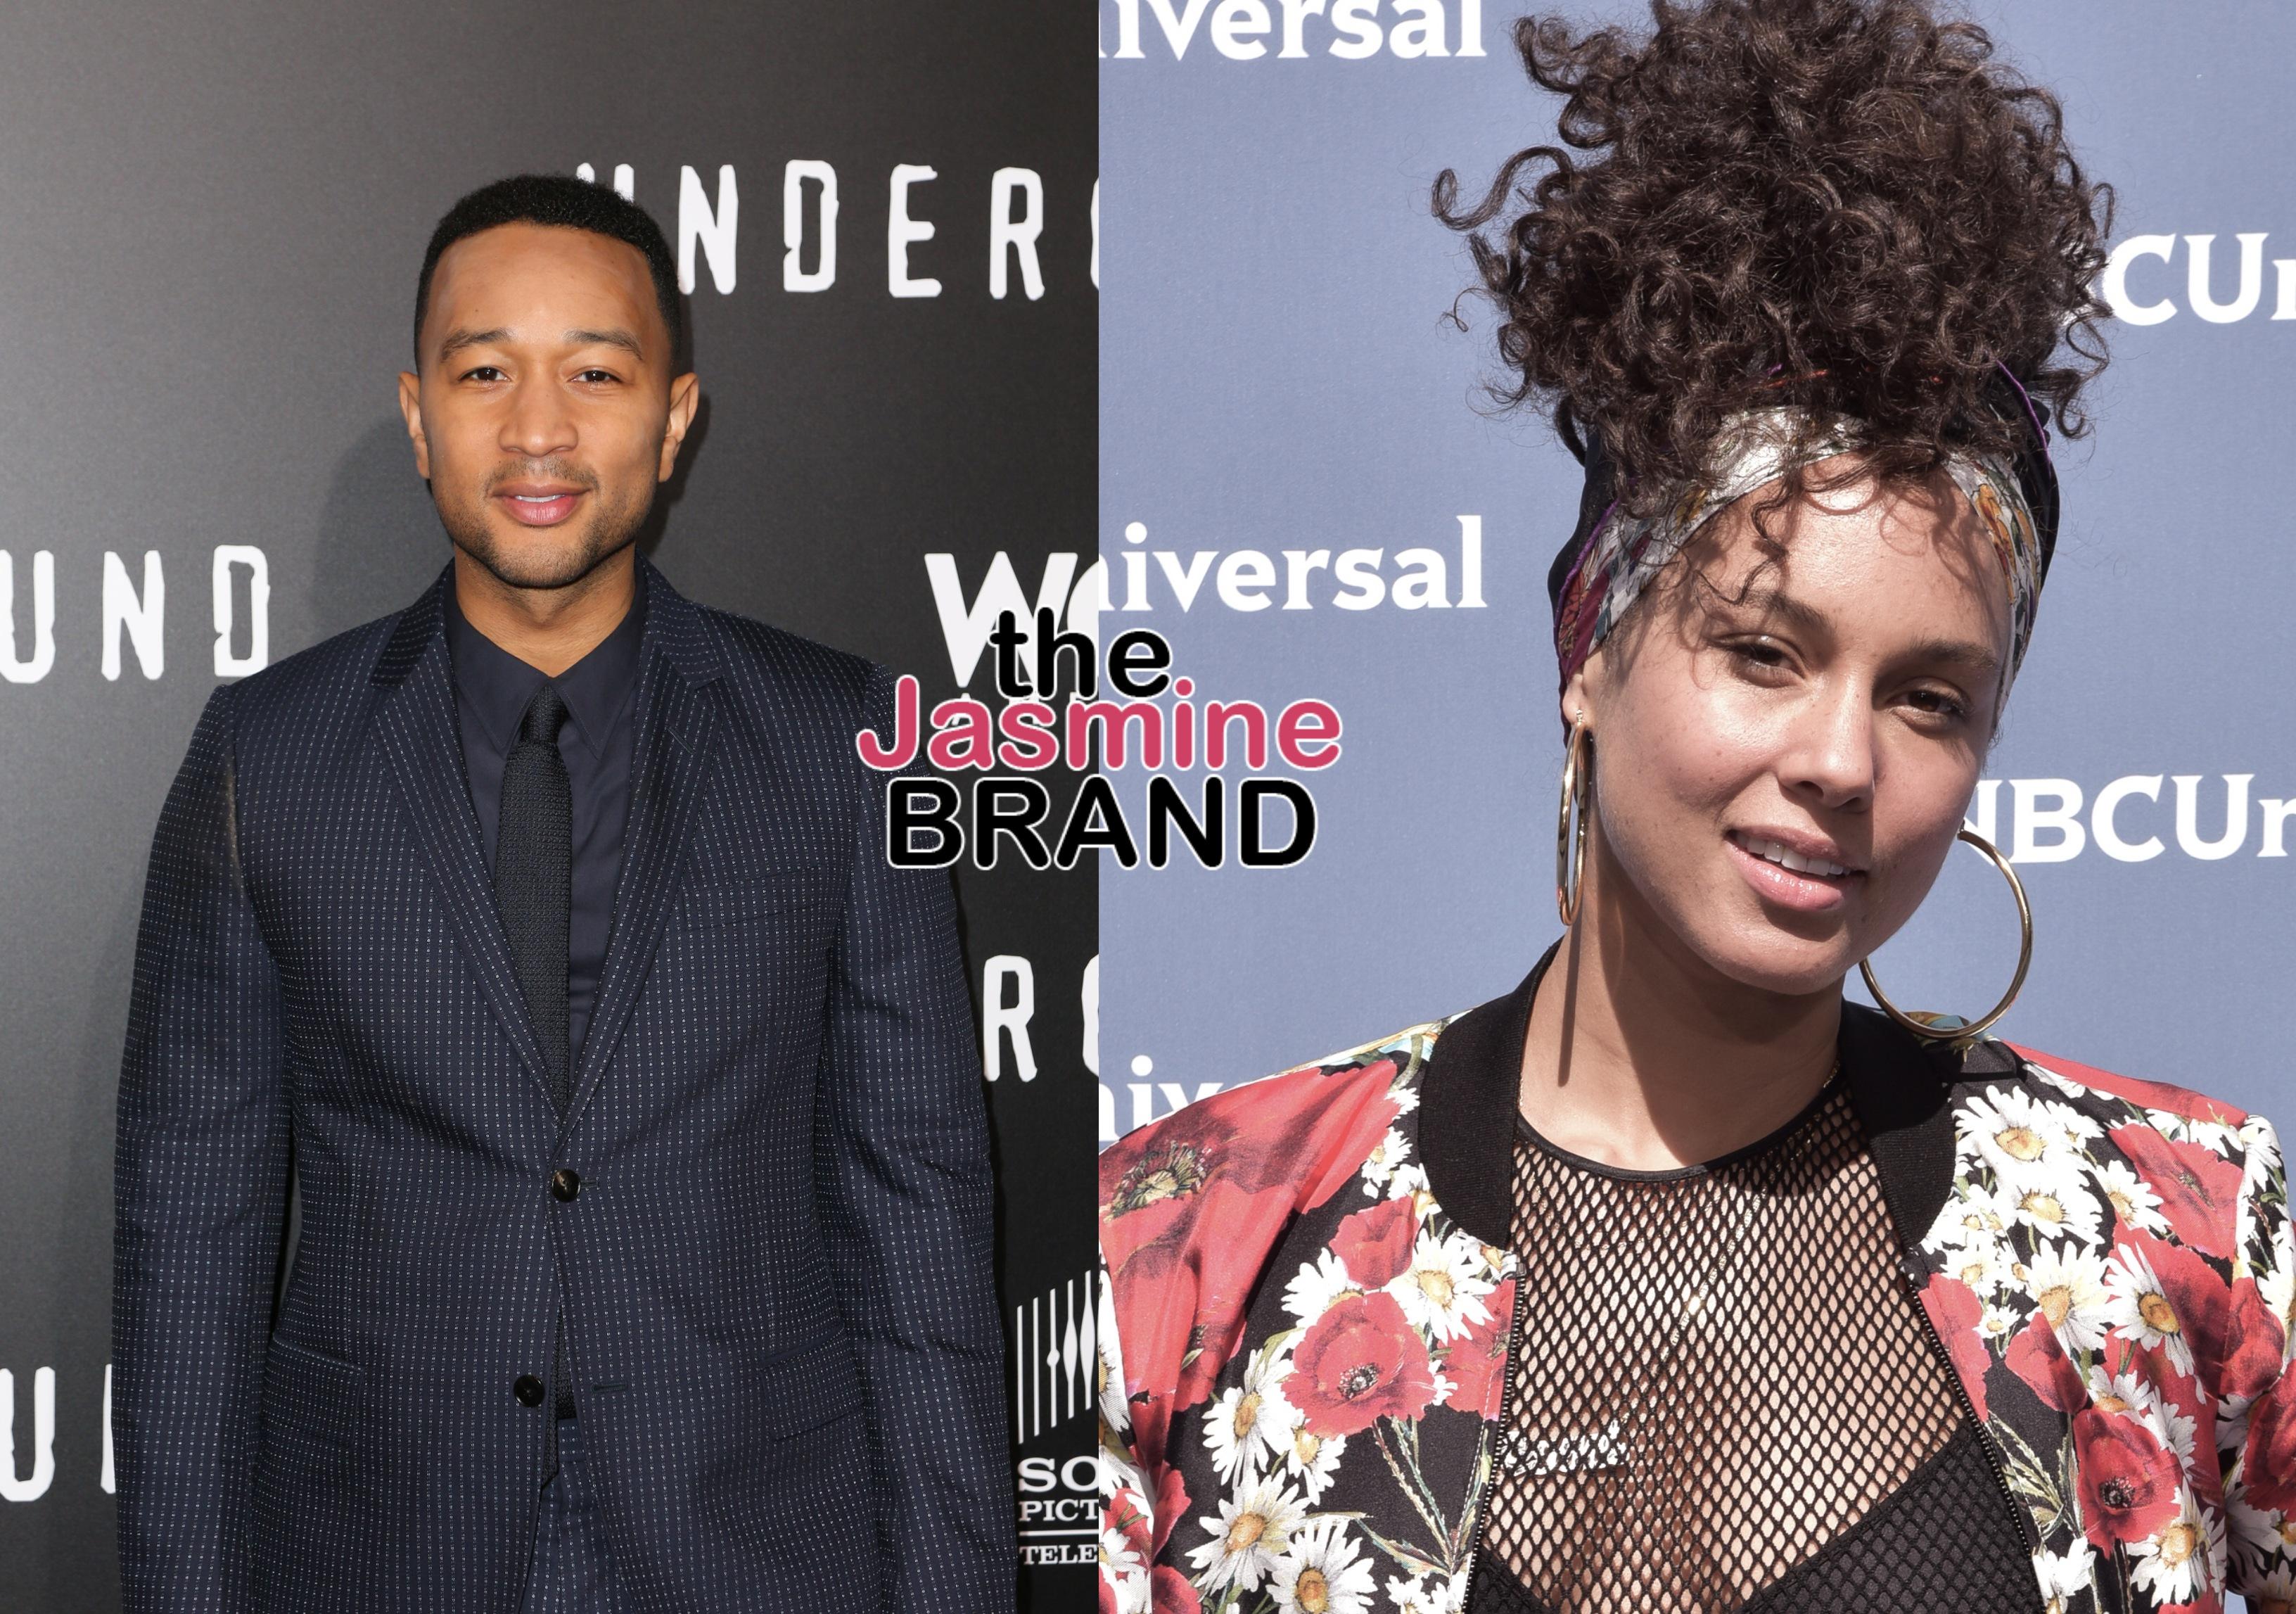 John Legend Alicia Keys Verzuz Battle Is Possibly In The Works Thejasminebrand